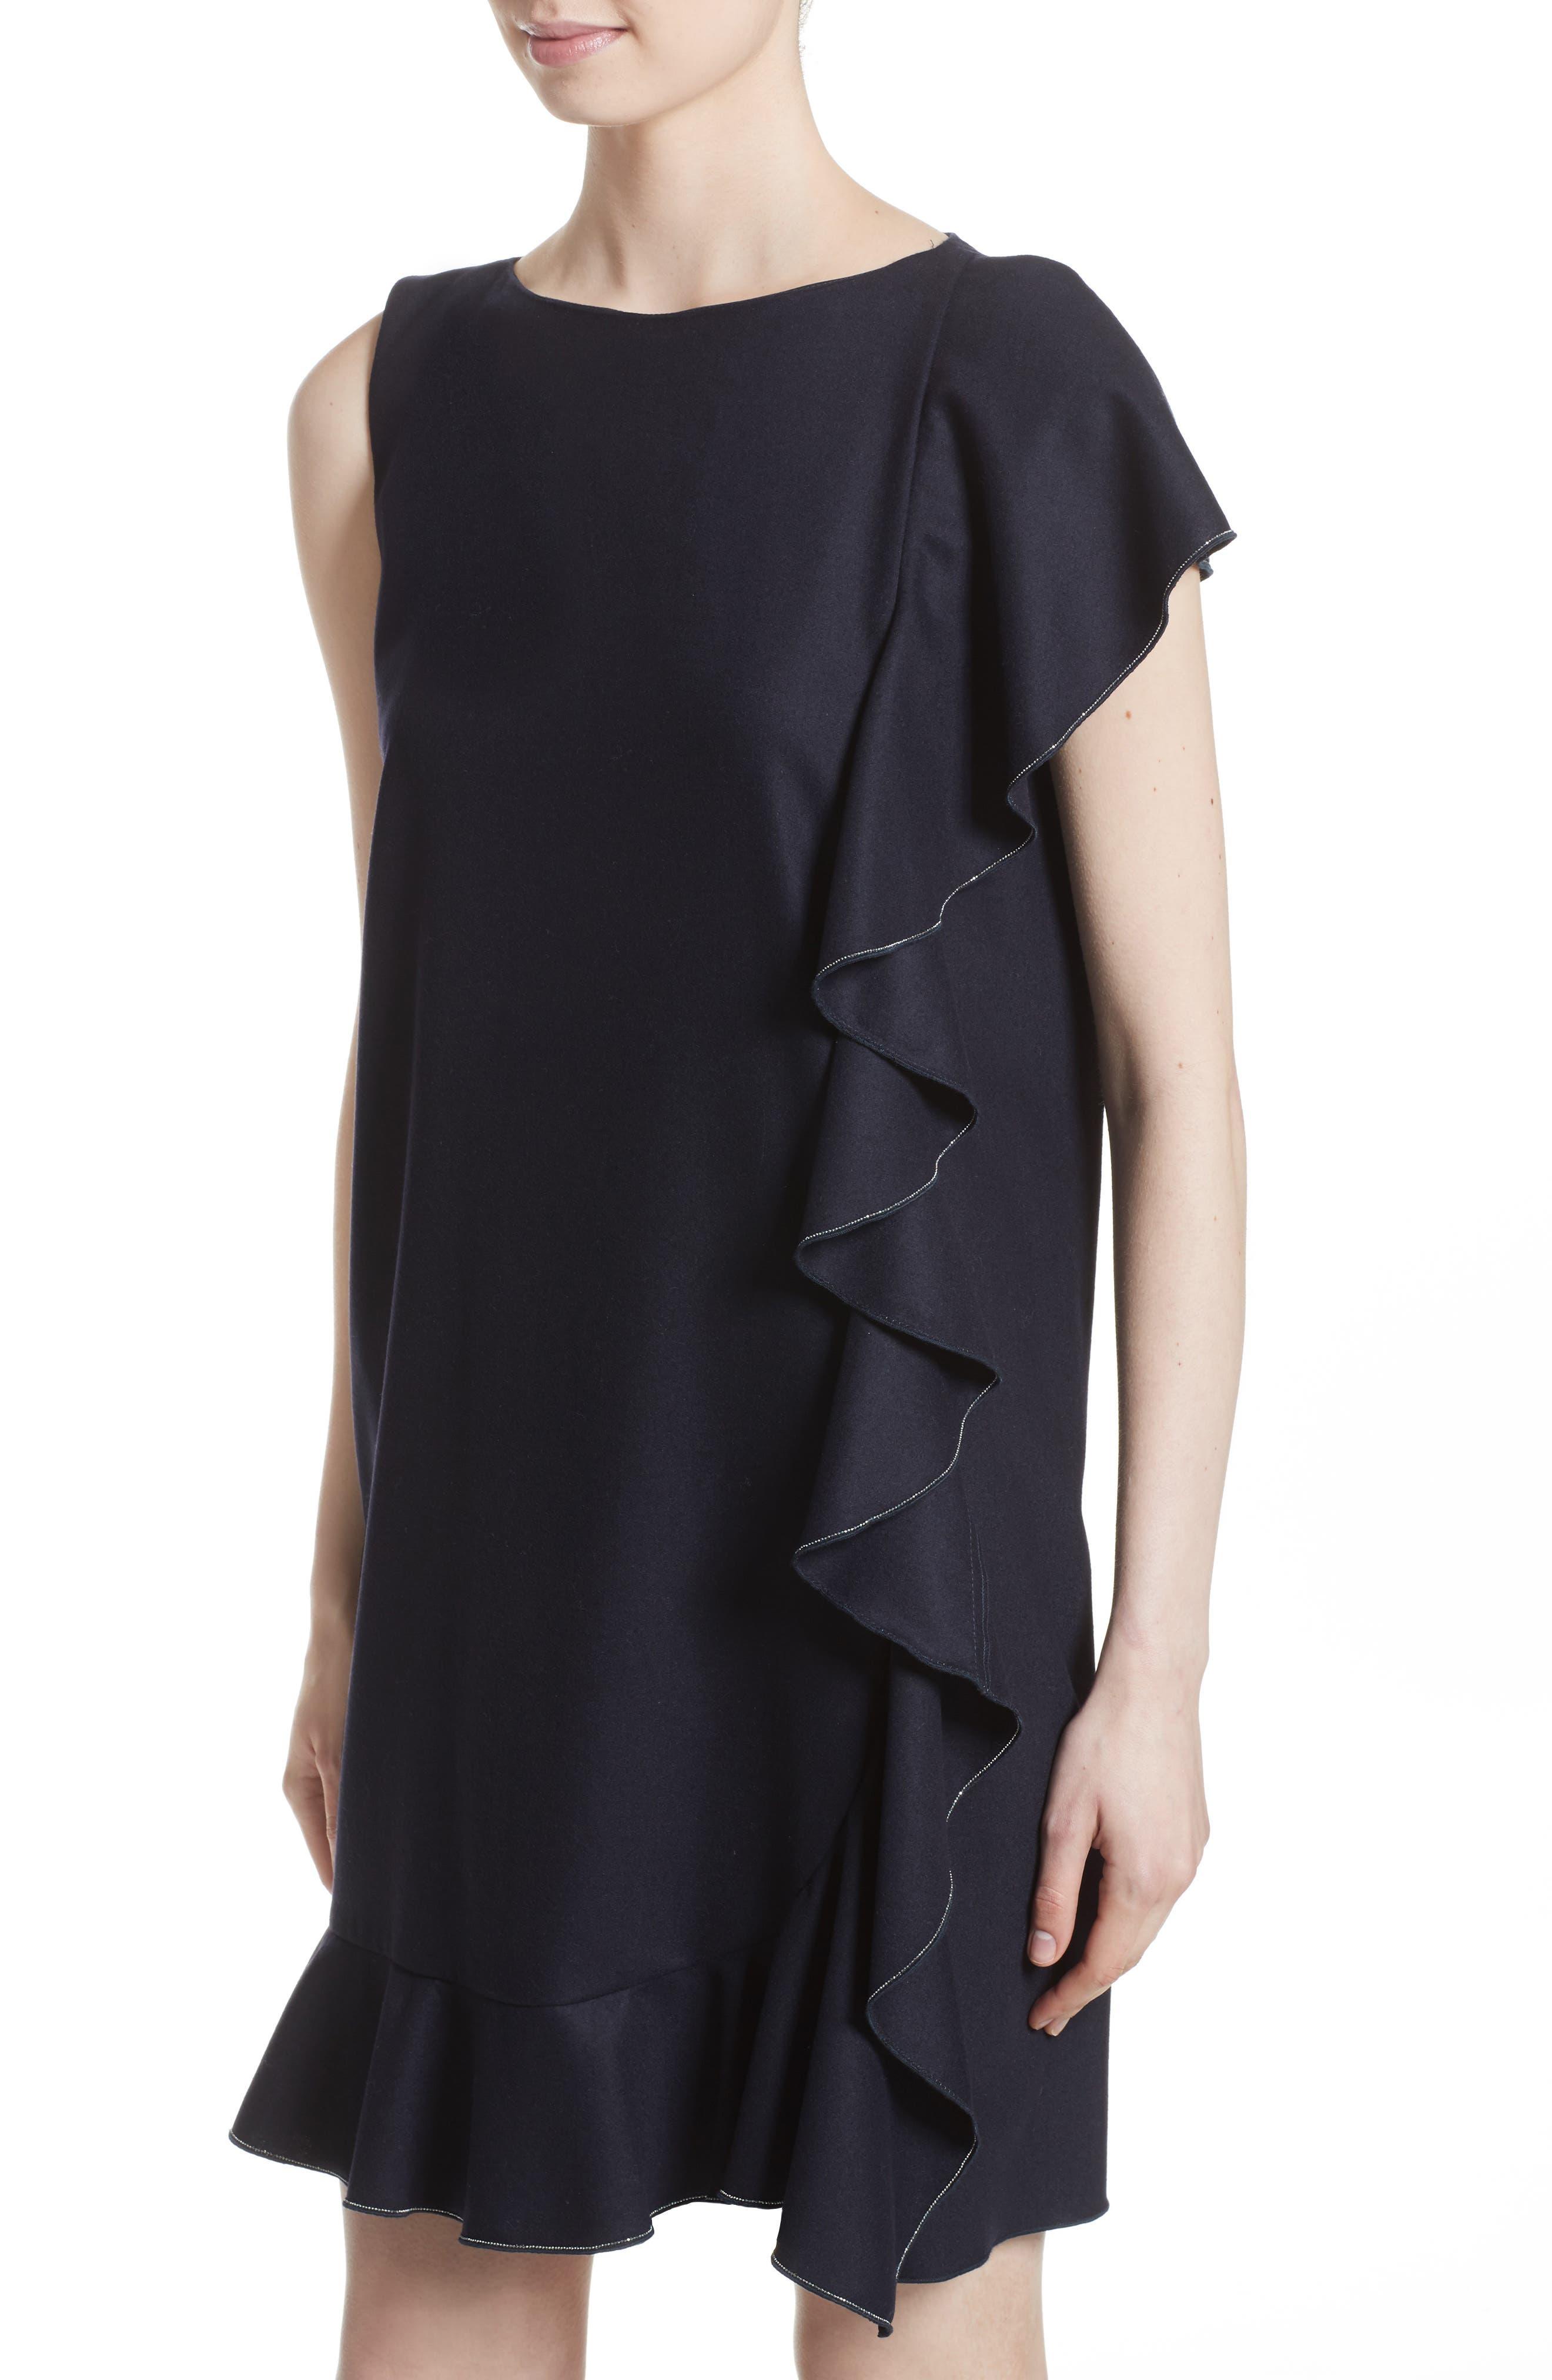 FABIANA FILIPPI,                             Stretch Wool & Cashmere Ruffle Dress,                             Alternate thumbnail 4, color,                             400